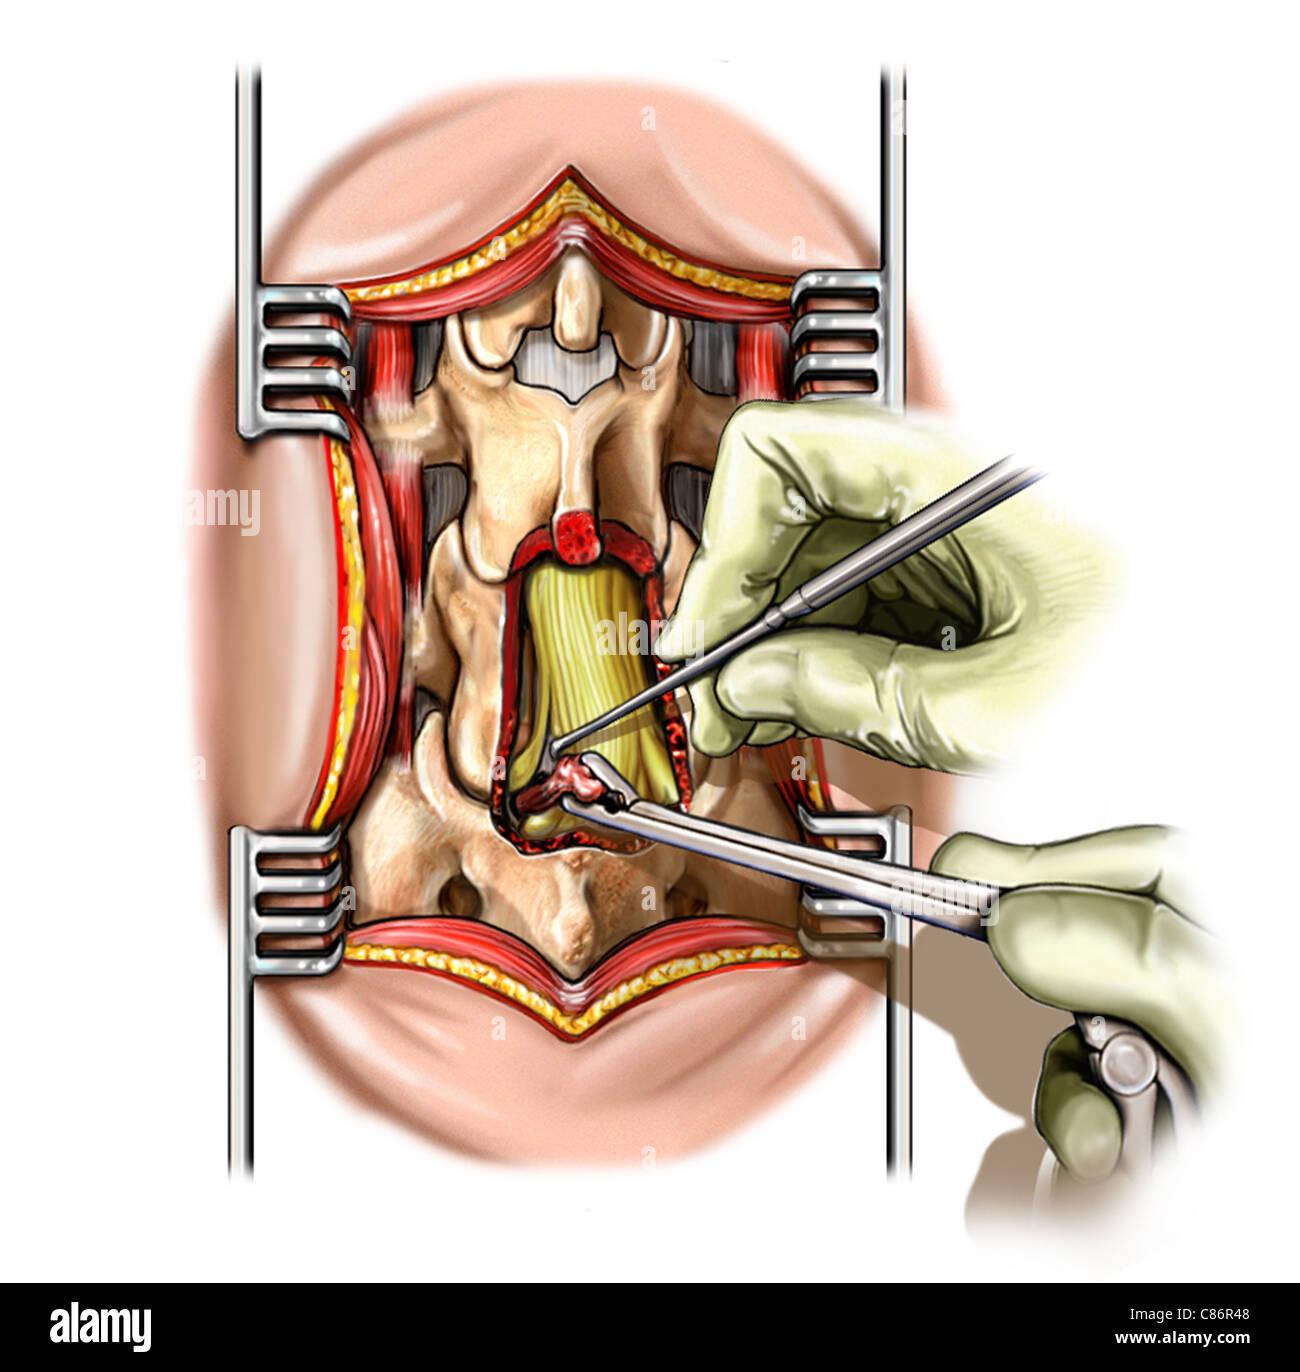 Lumbar L5 Spine Discectomy S1